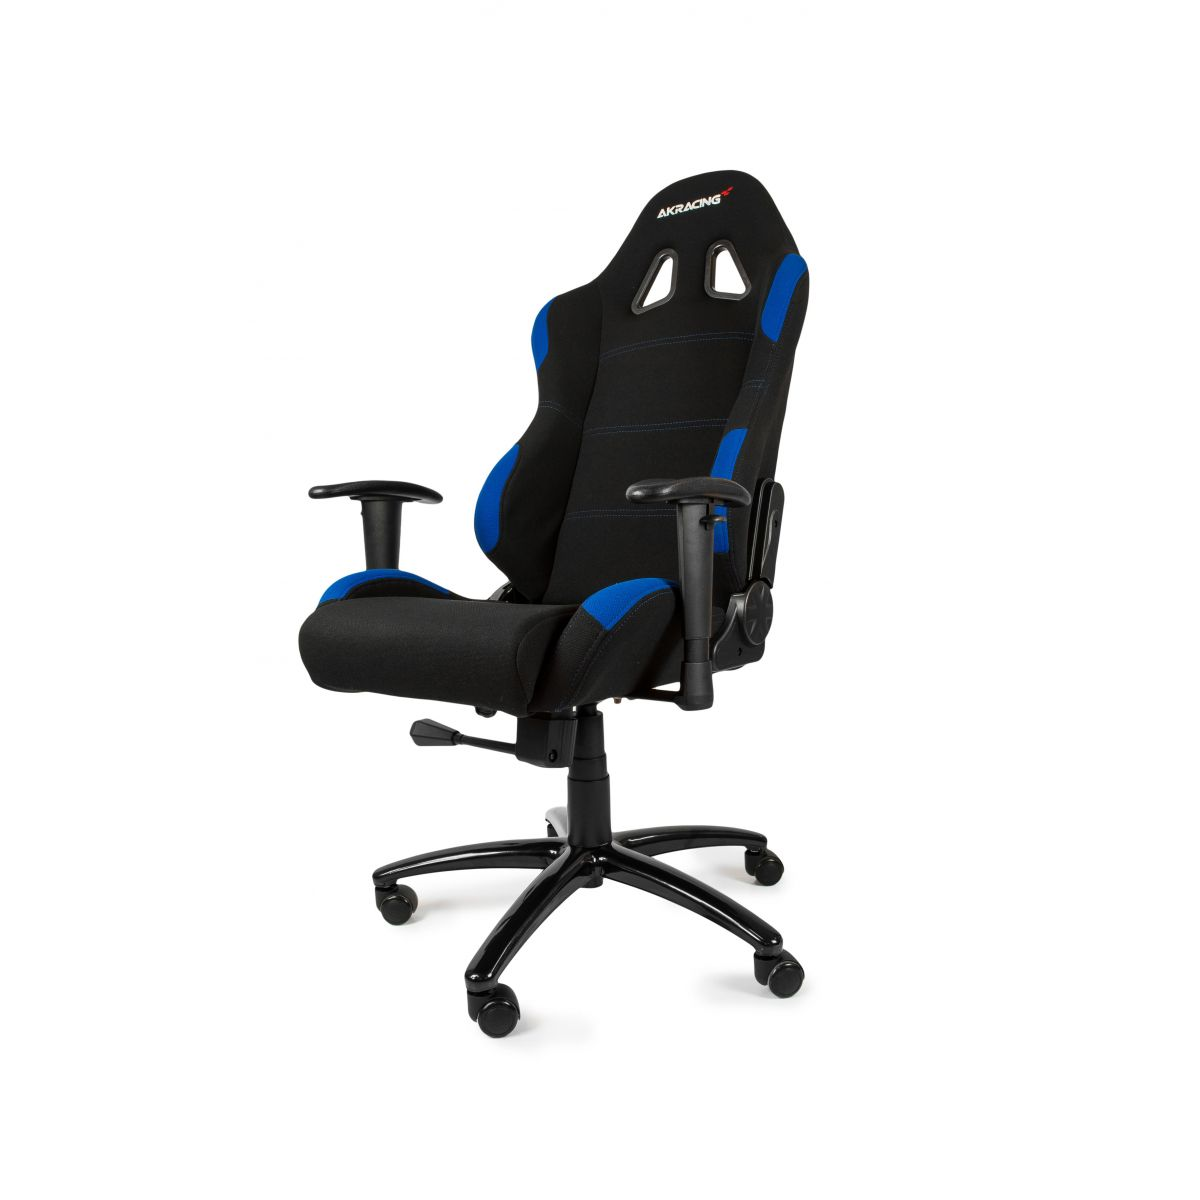 Cadeira AKRacing Gaming AK-K7012-BL Black/Blue - AKRacing